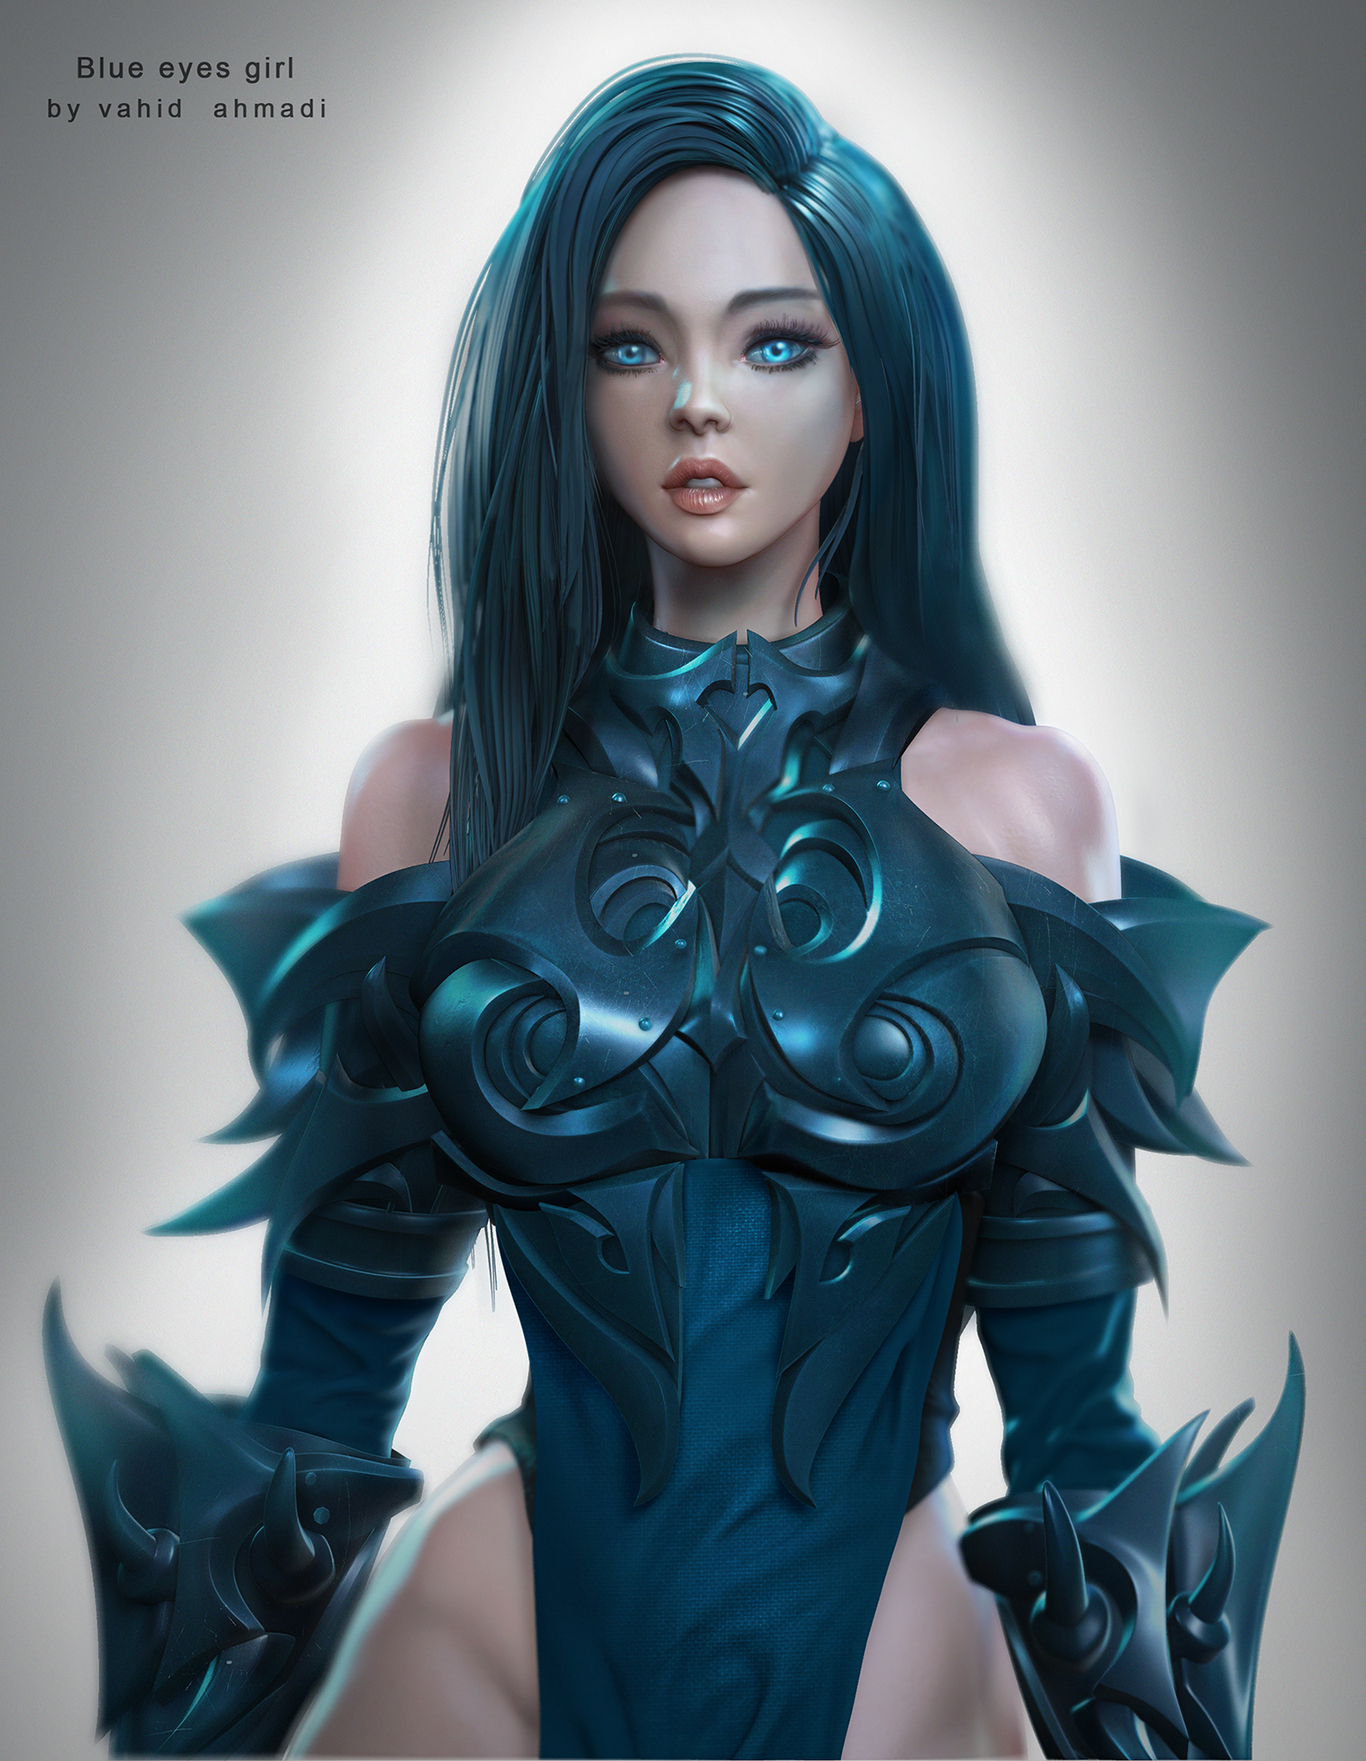 Vahidahmadi3d blue eyes girl with  1 56cb2eee q6g5